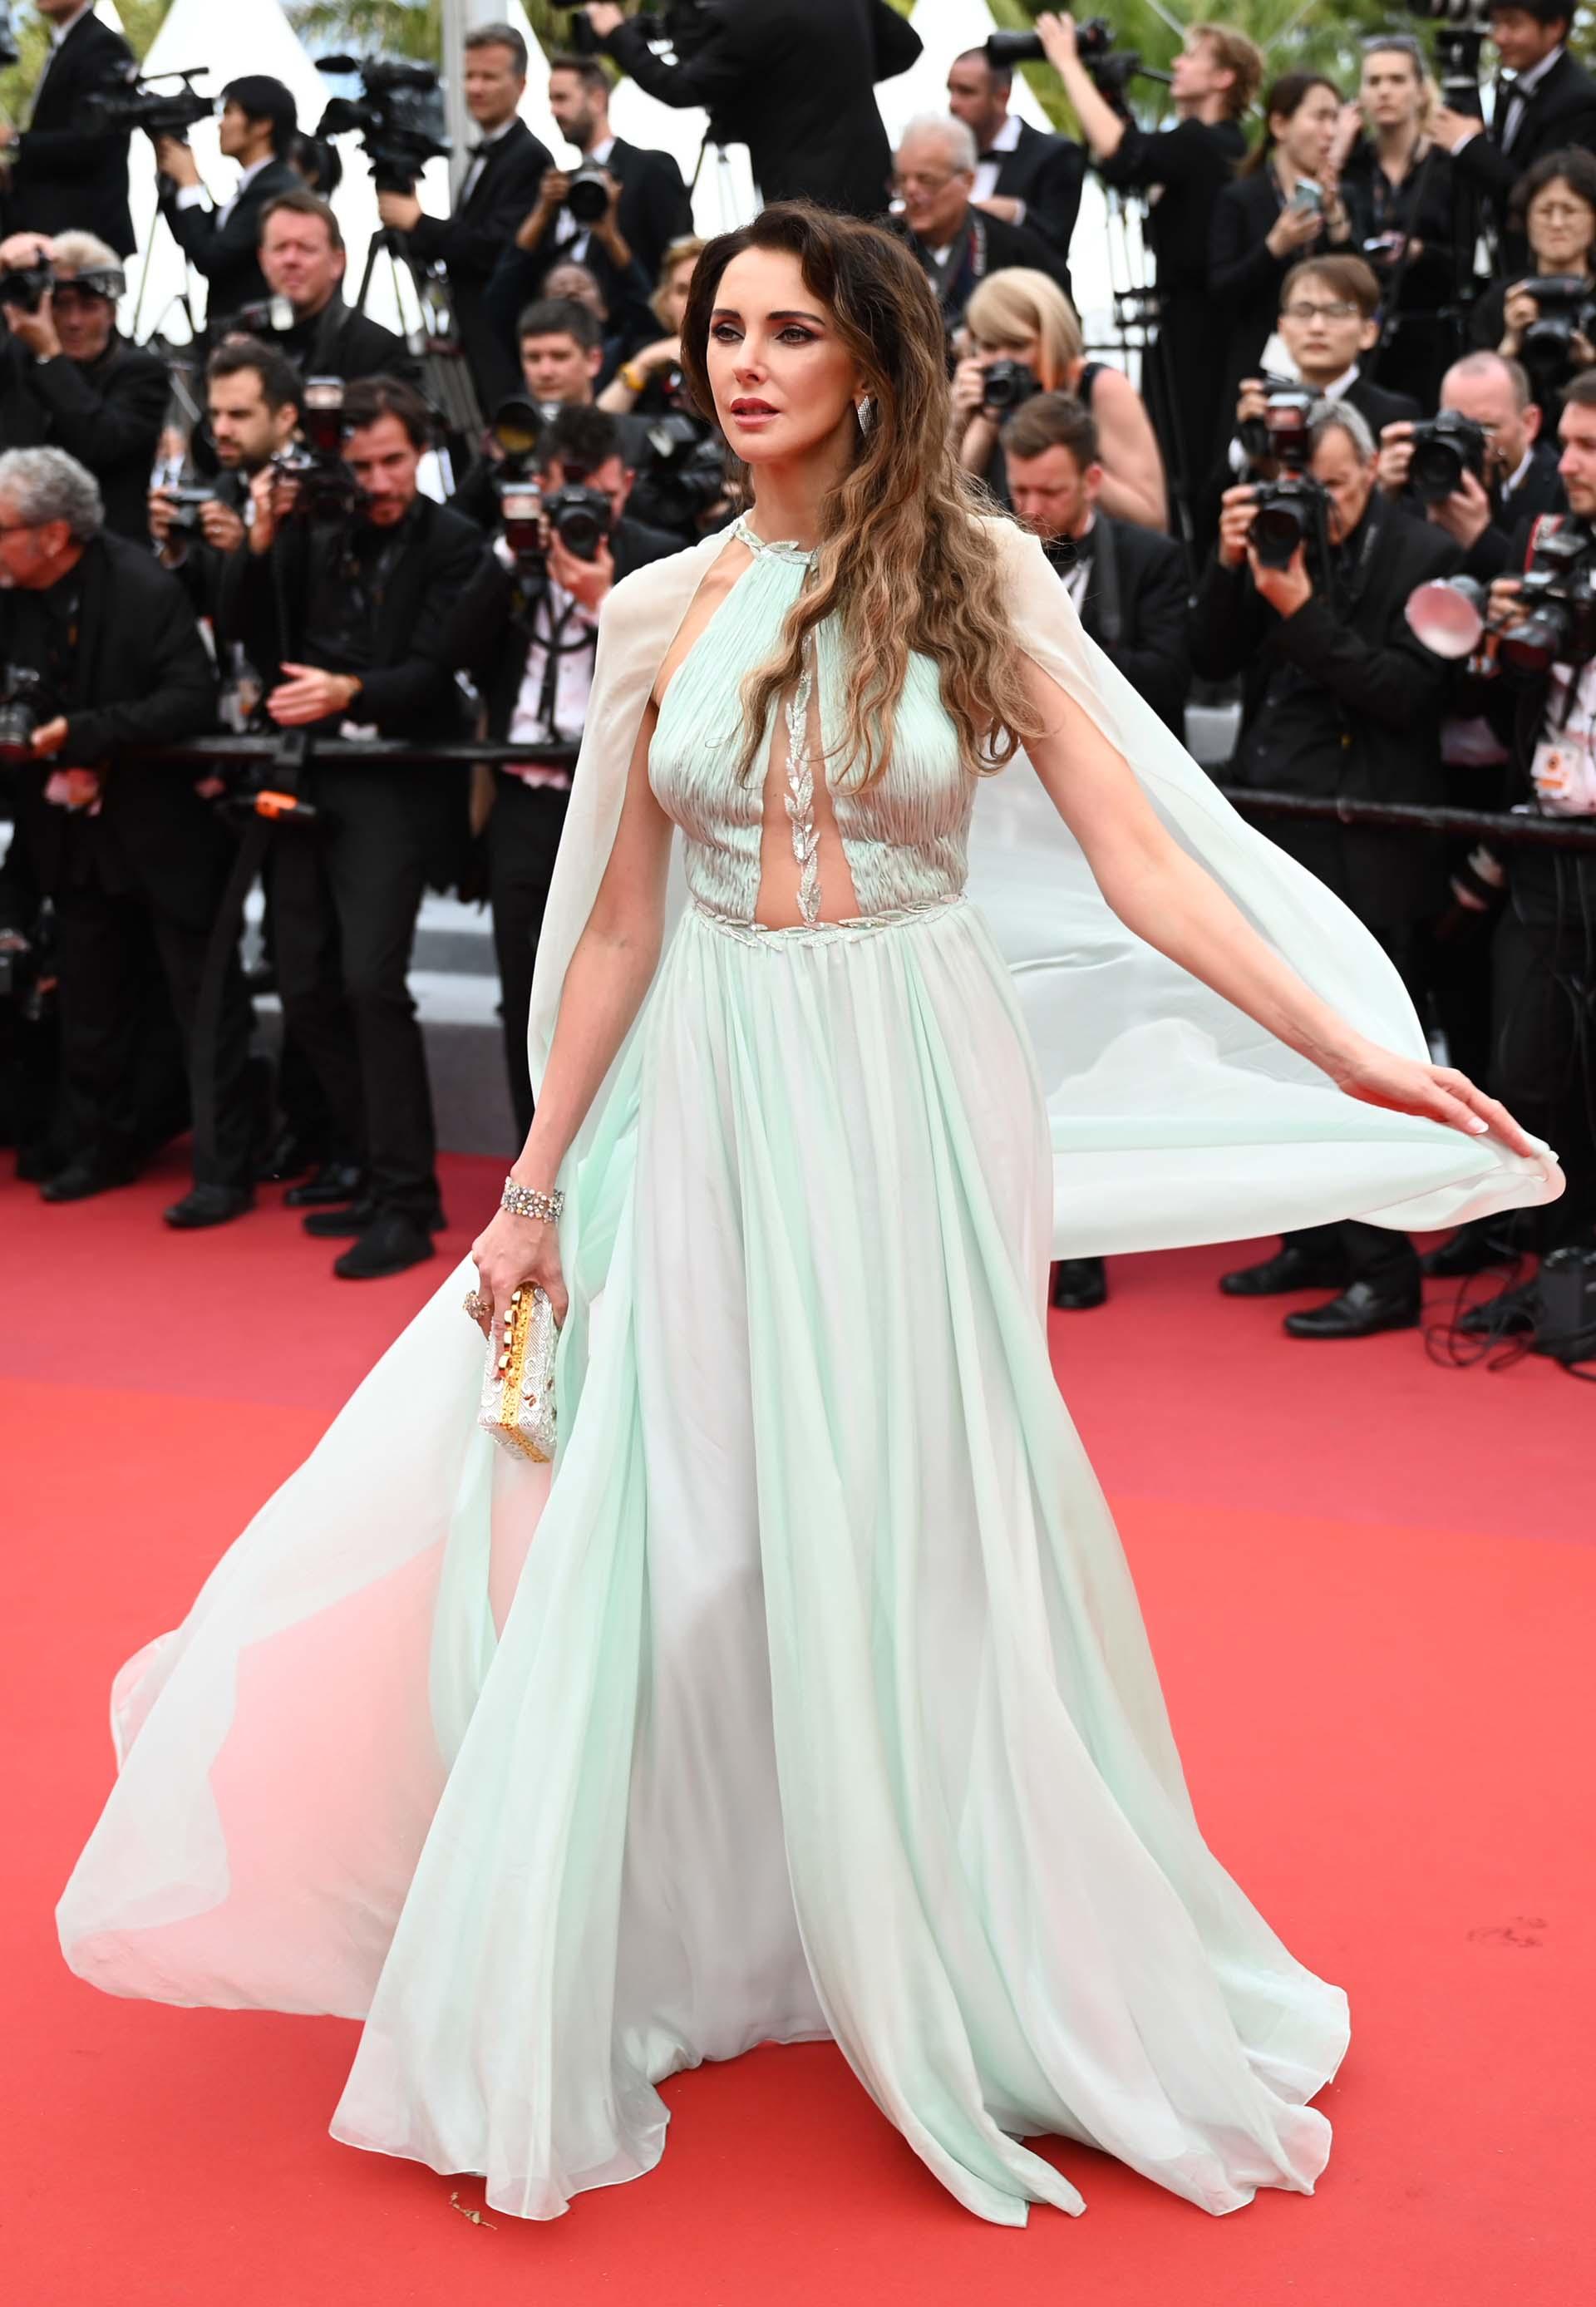 La actriz francesa Frederique Bel